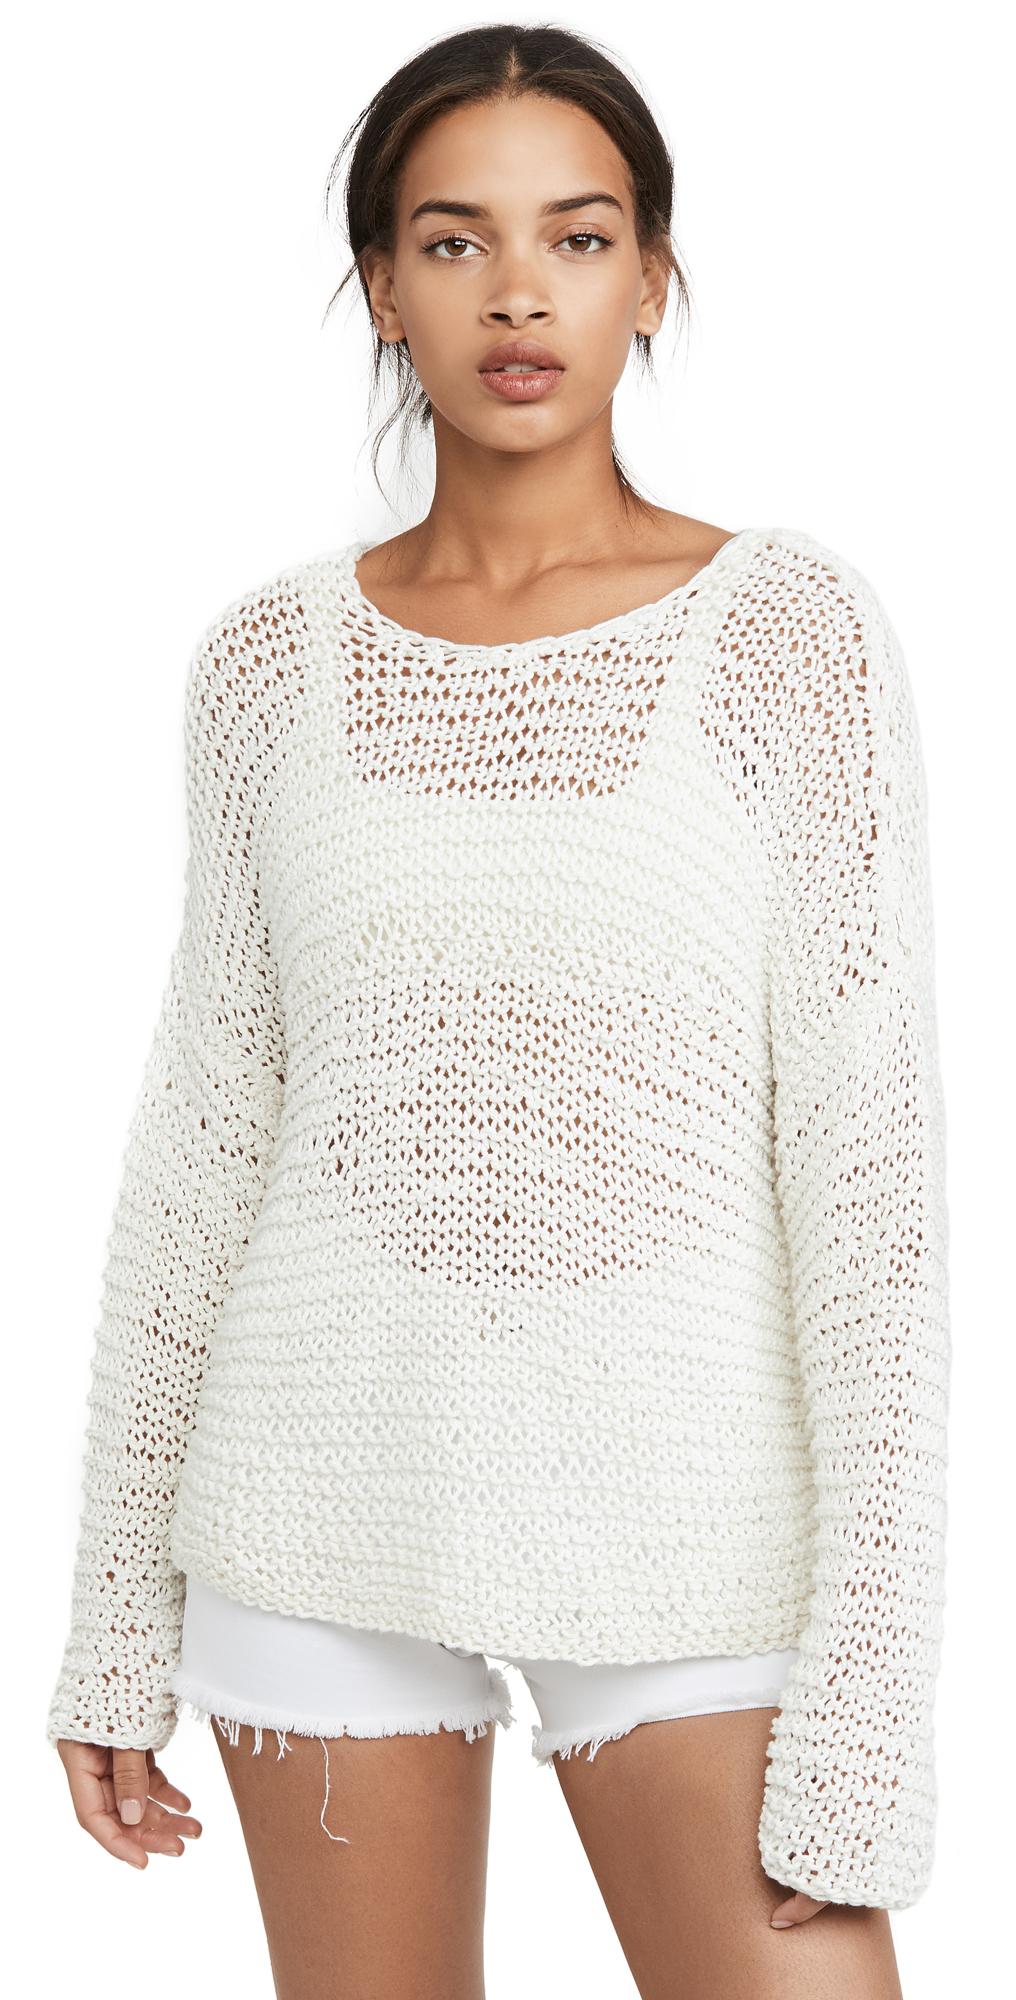 Mehetia Long Sleeve Knit